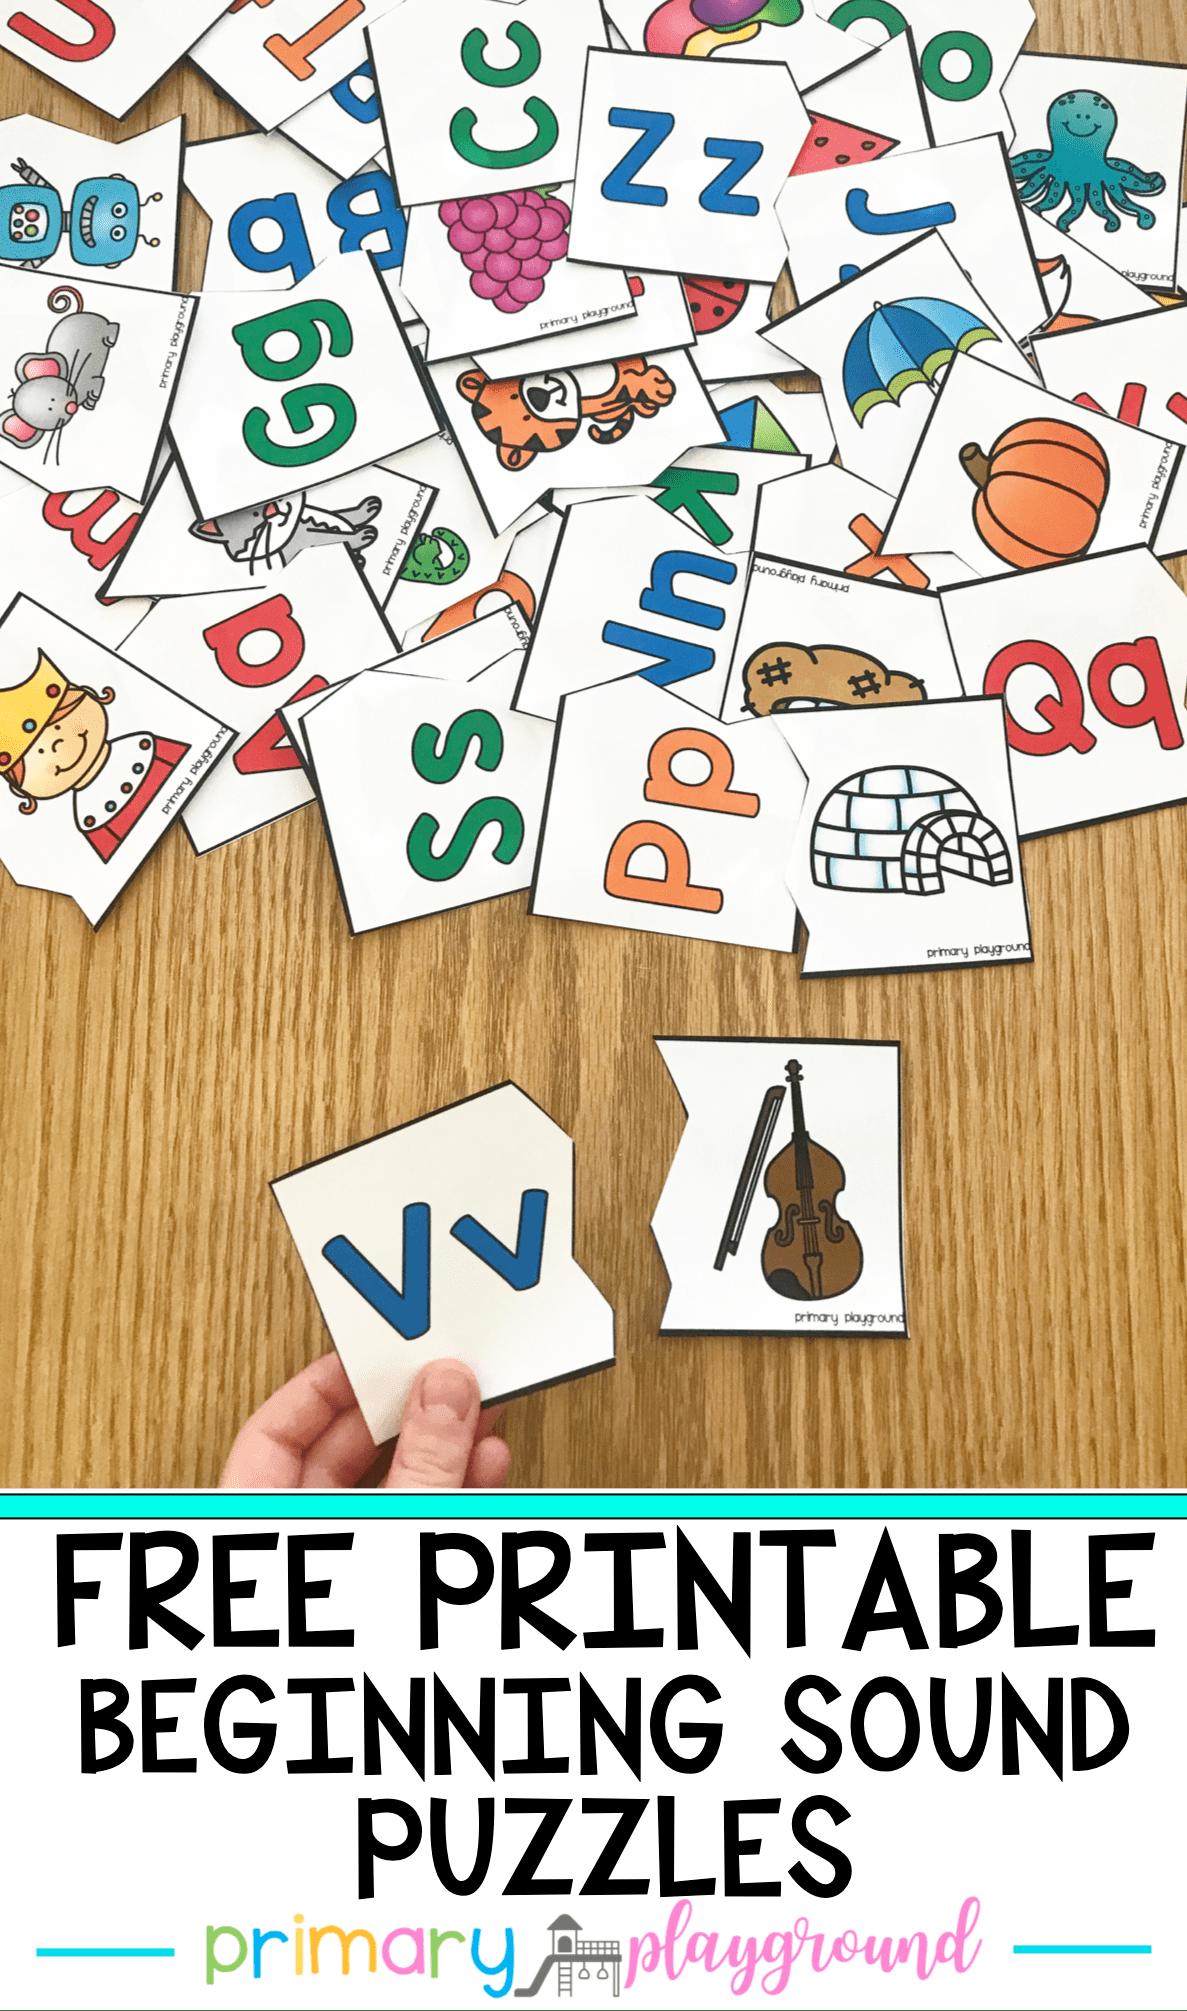 Free Printable Beginning Sound Puzzles Primary Playground Sound Puzzle Beginning Sounds Worksheets Beginning Sounds Kindergarten [ 2011 x 1187 Pixel ]